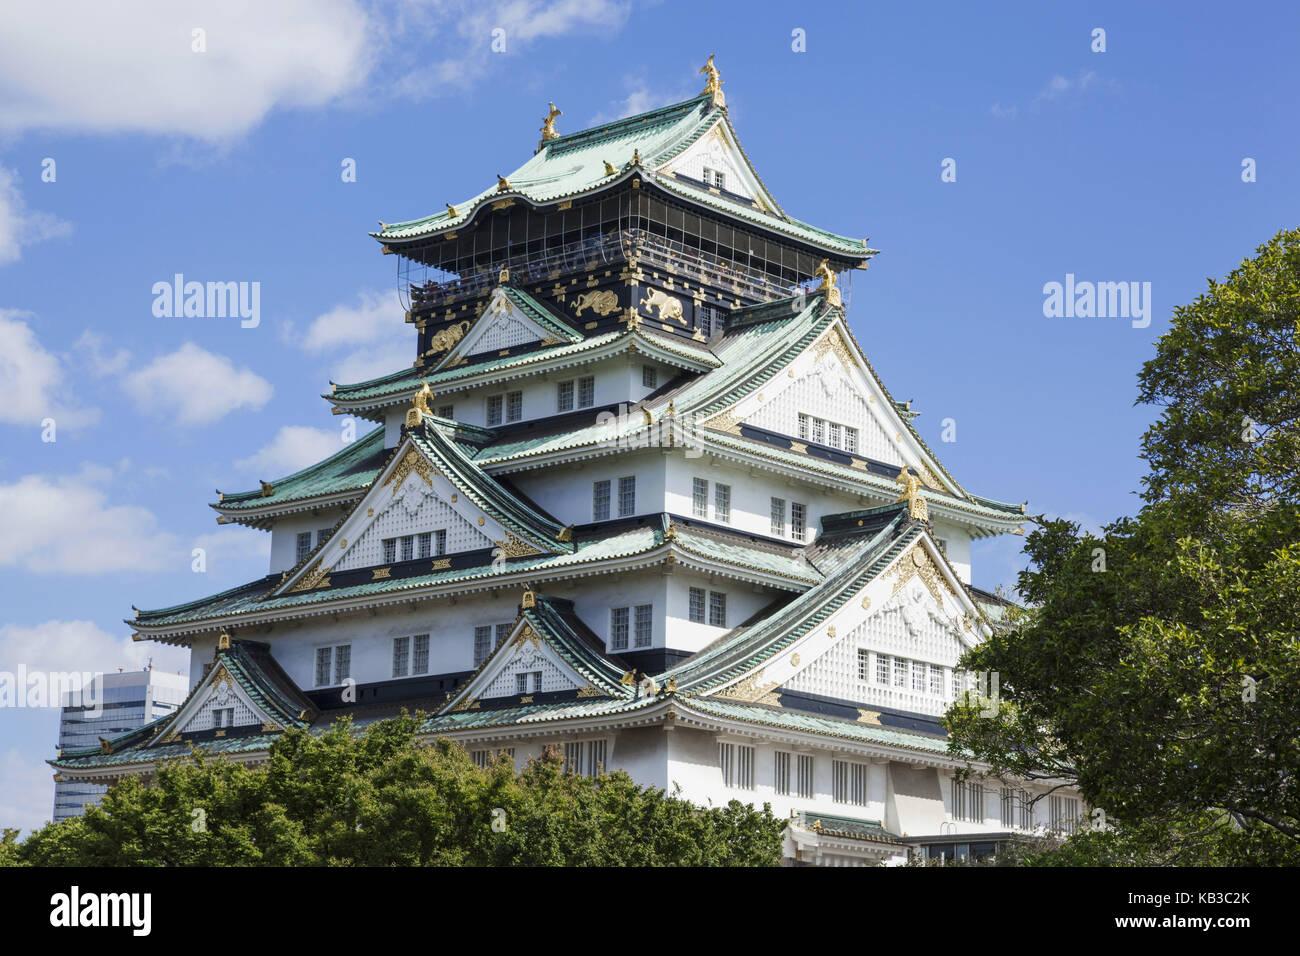 Japan, Honshu, Kansai, Osaka, castle, - Stock Image